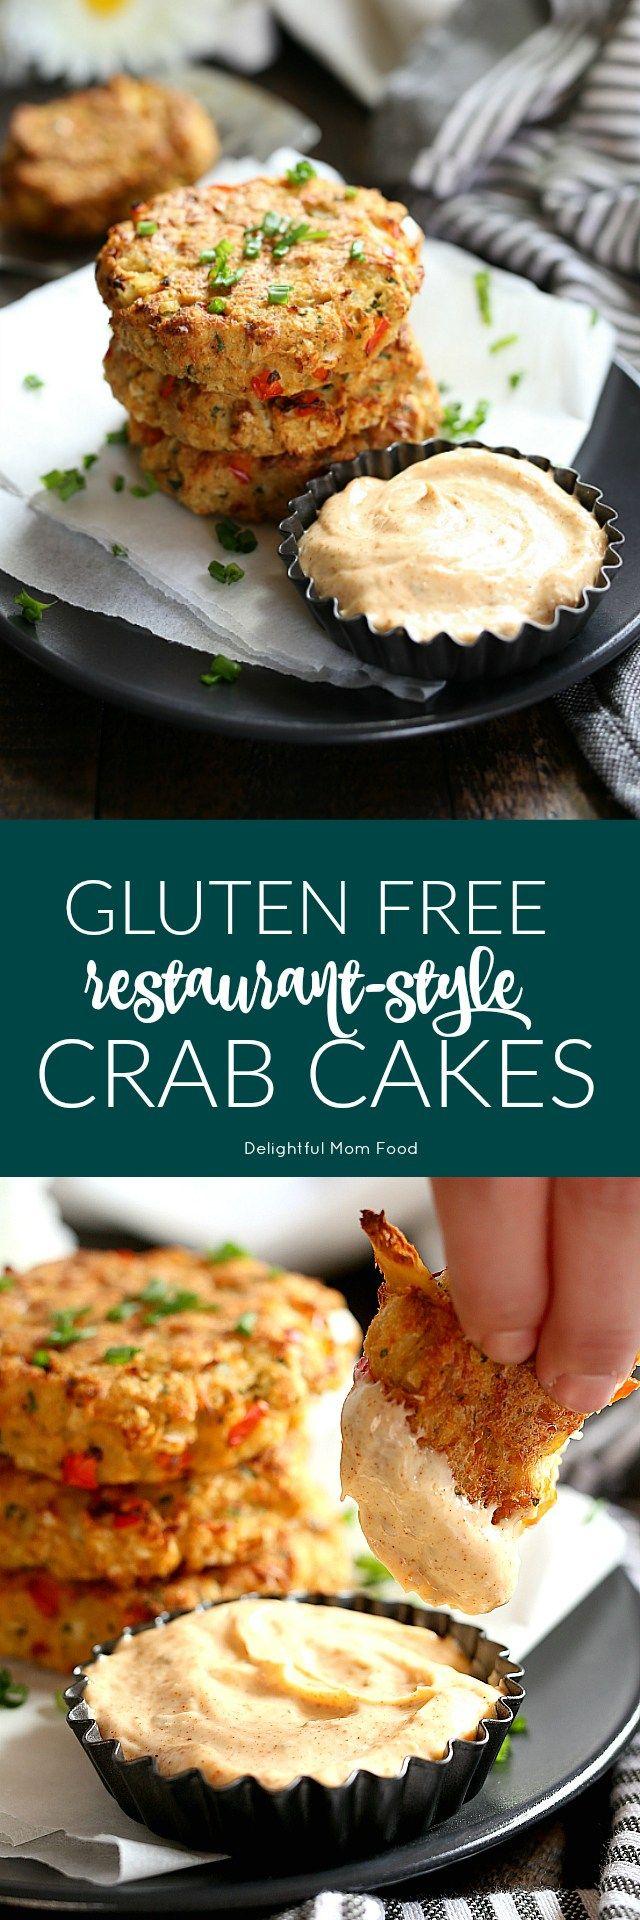 Restaurant Style Gluten Free Crab Cakes Recipe With Spicy Greek Yogurt Sauce